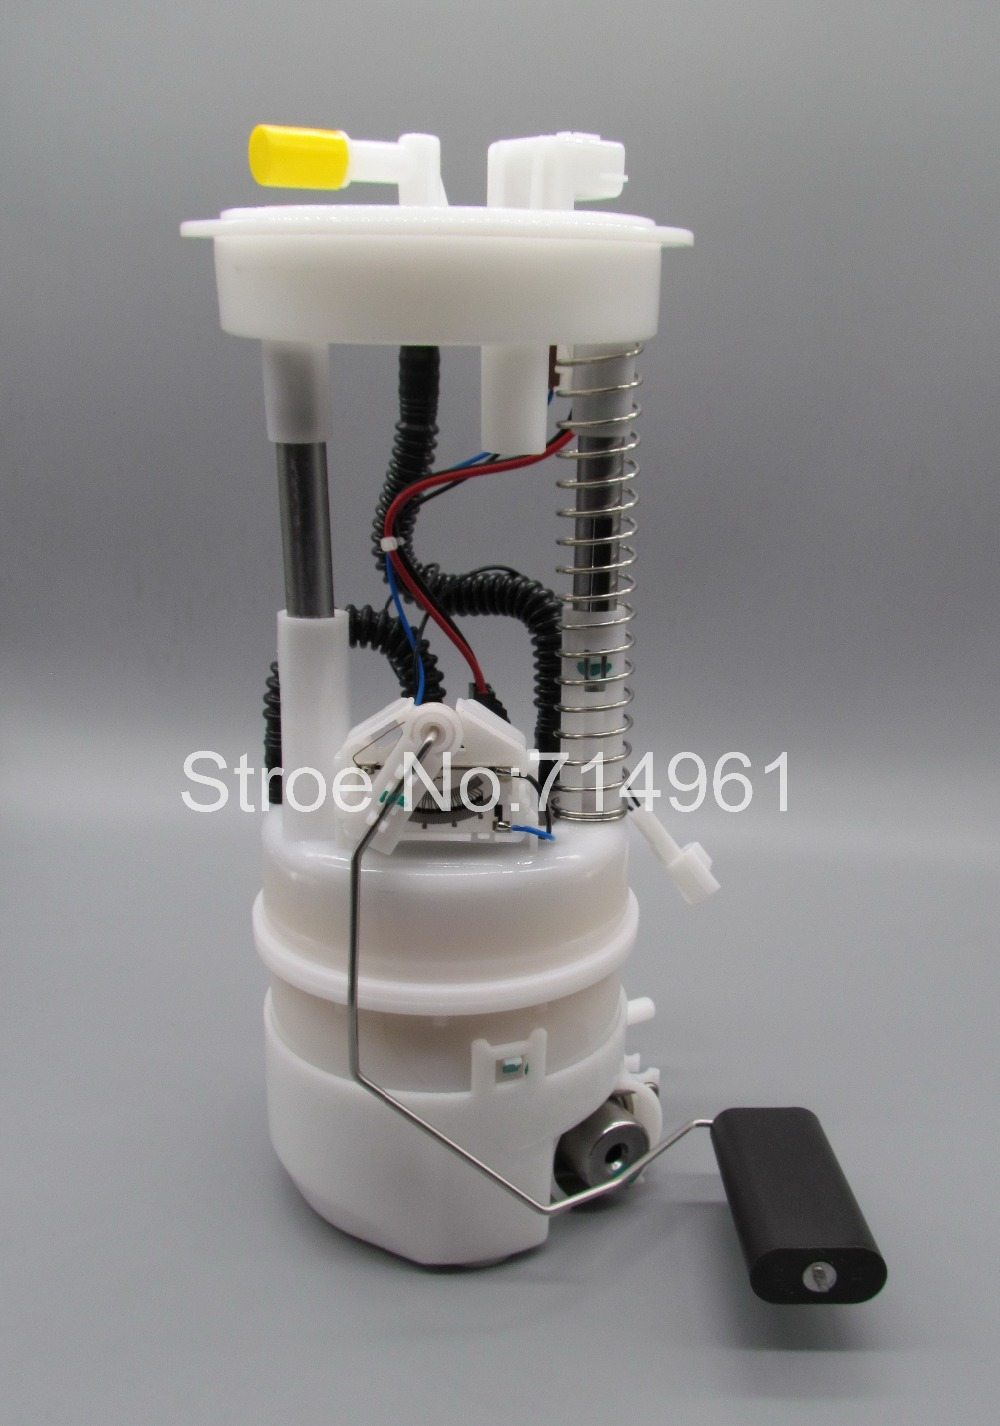 17040 3ZB0A 17040 JG00D High quality Fuel Pump Assembly case for Nissan Qashqai 4WD 2 0L